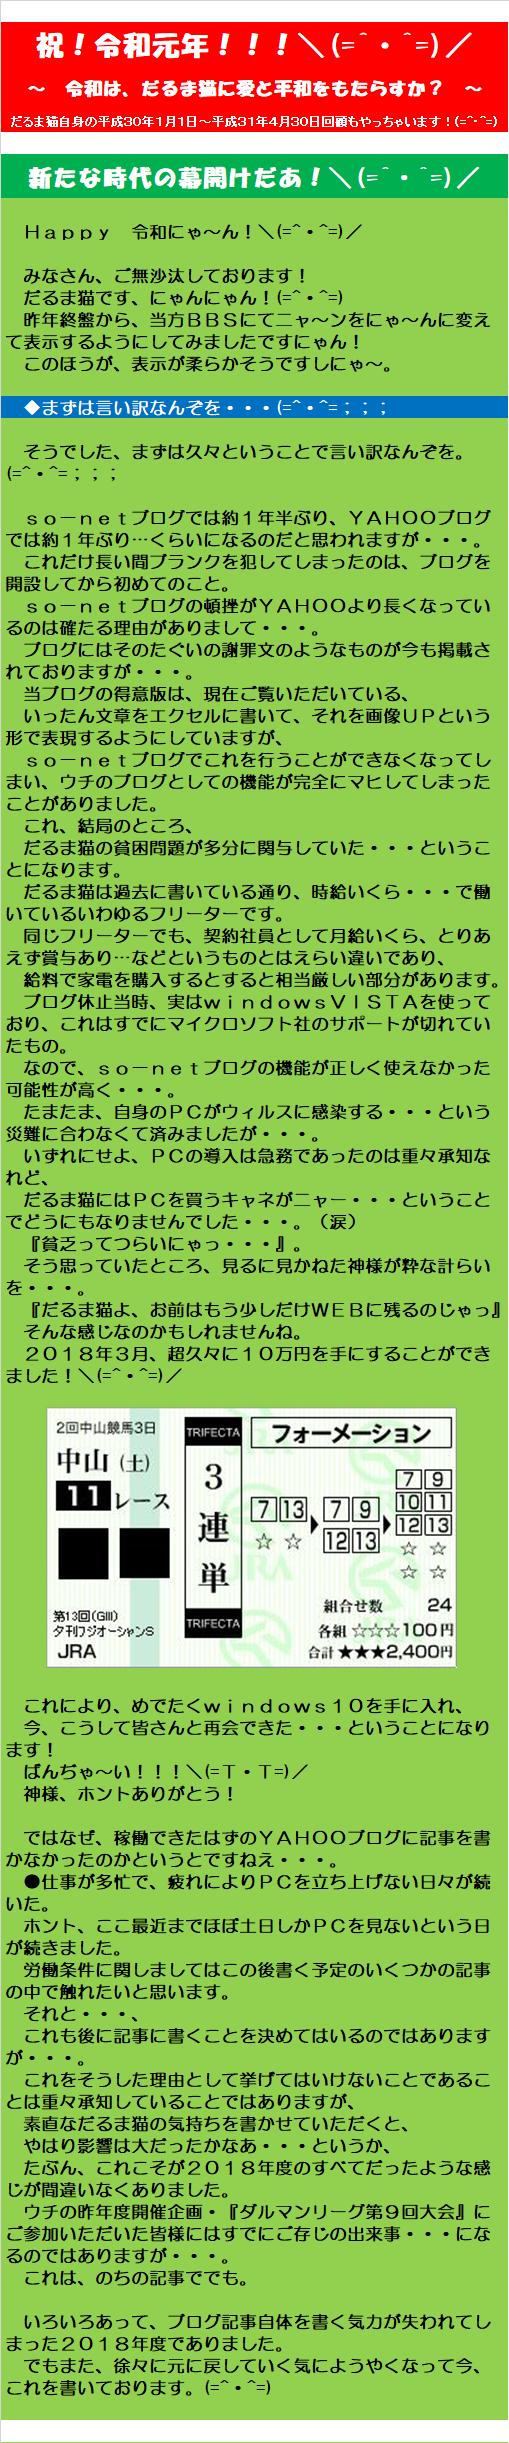 20190505・祝!令和元年!!!\(=^・^=)/①.png